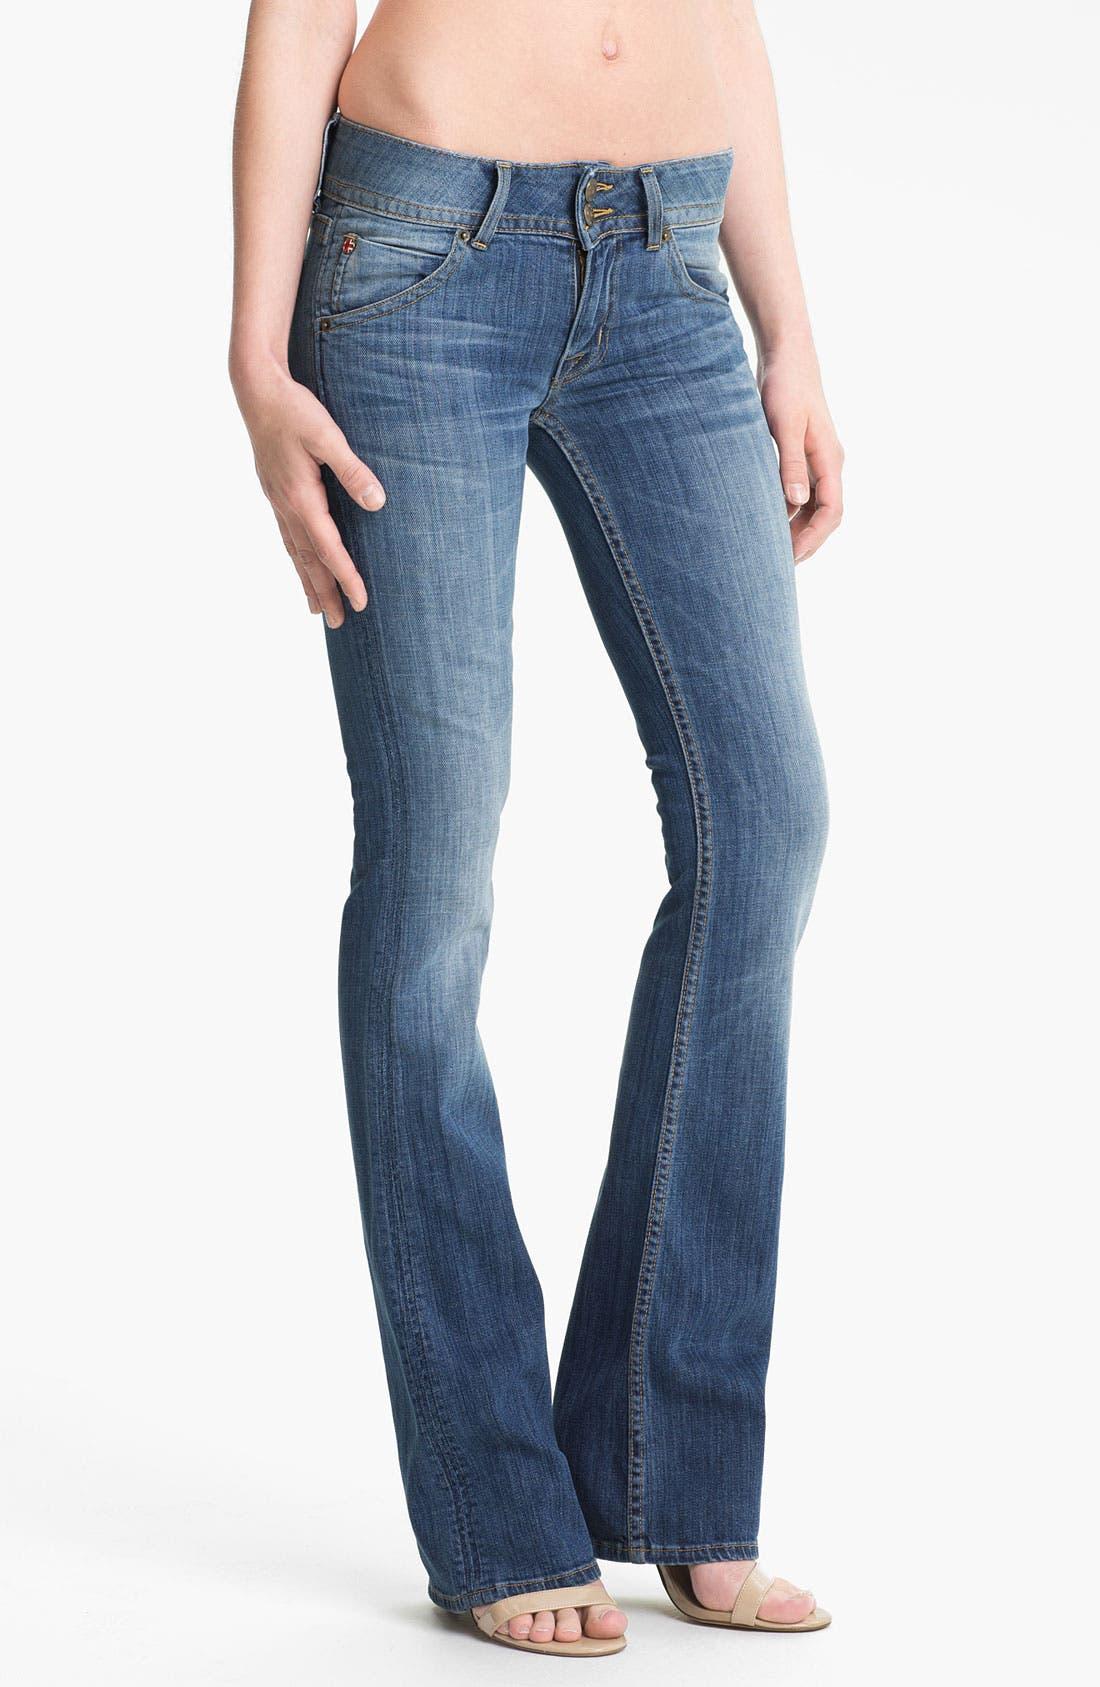 Alternate Image 1 Selected - Hudson Jeans Signature Flap Pocket Bootcut Jeans (Milo)